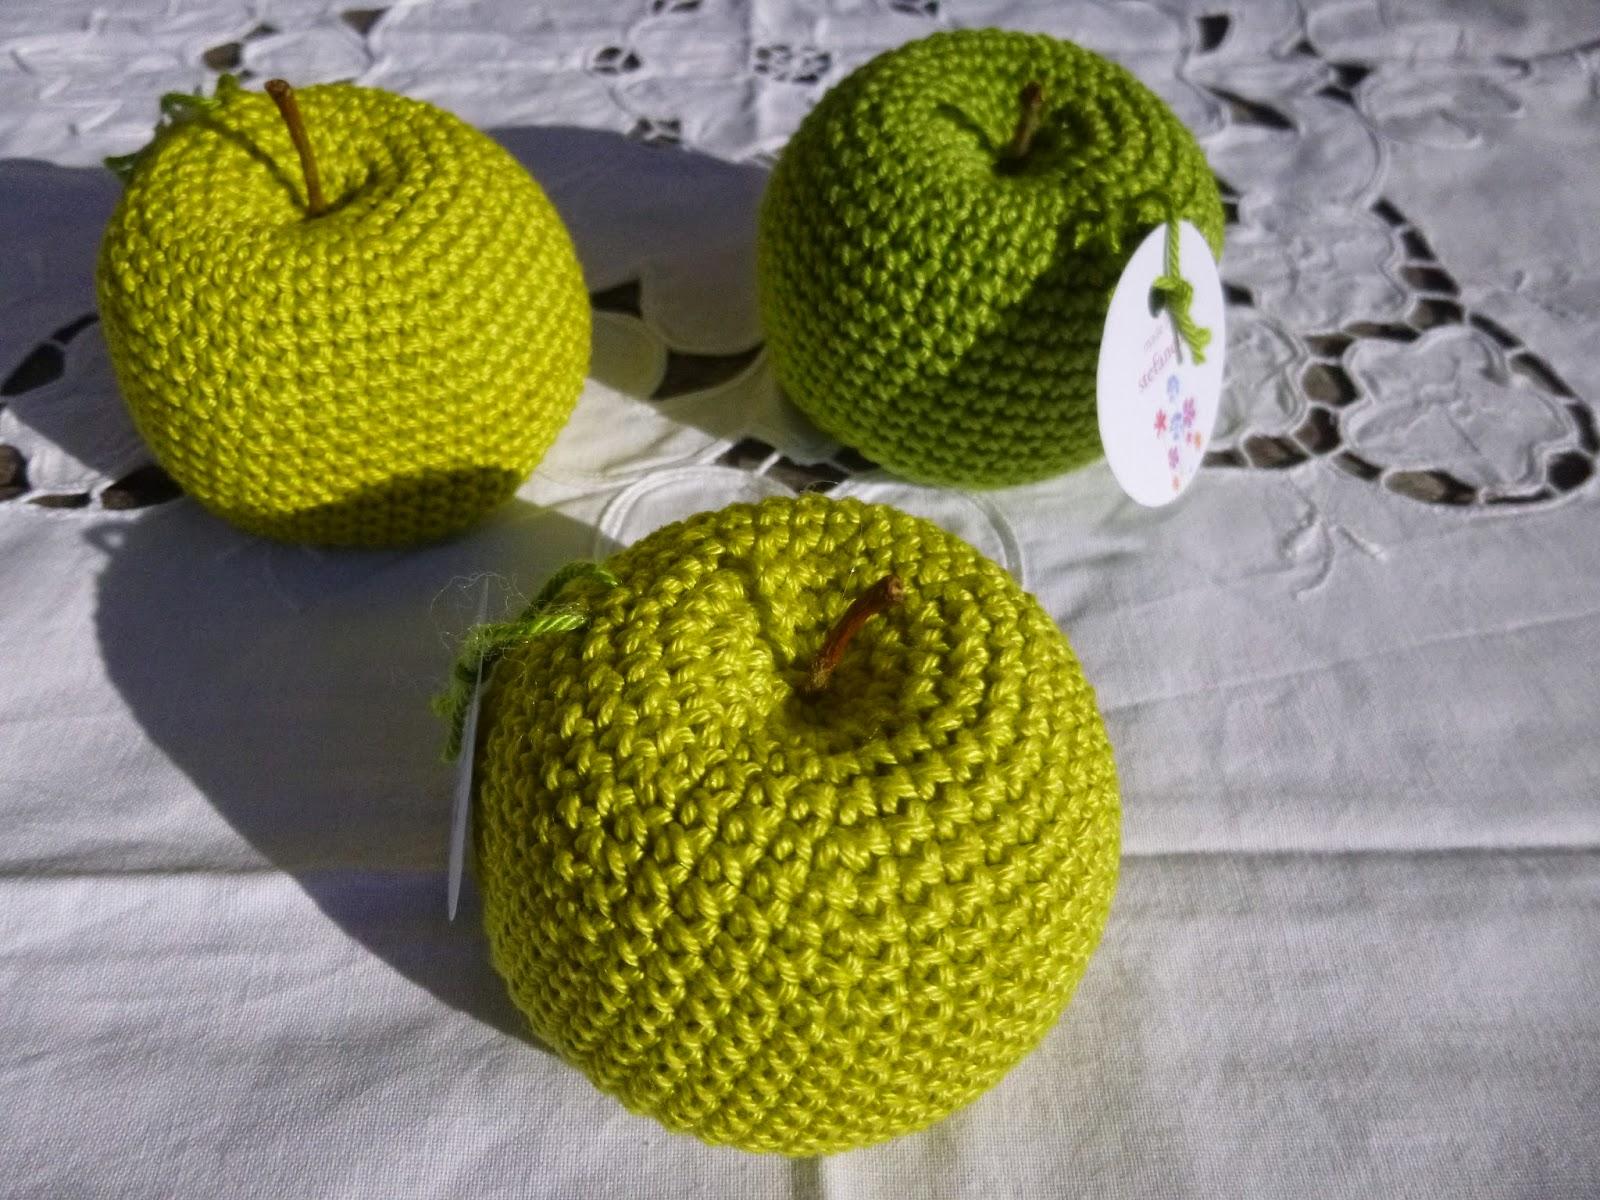 Häkeln im Quadrat: stefanella´s Gypsy-CAL VIII: Apfelgrün